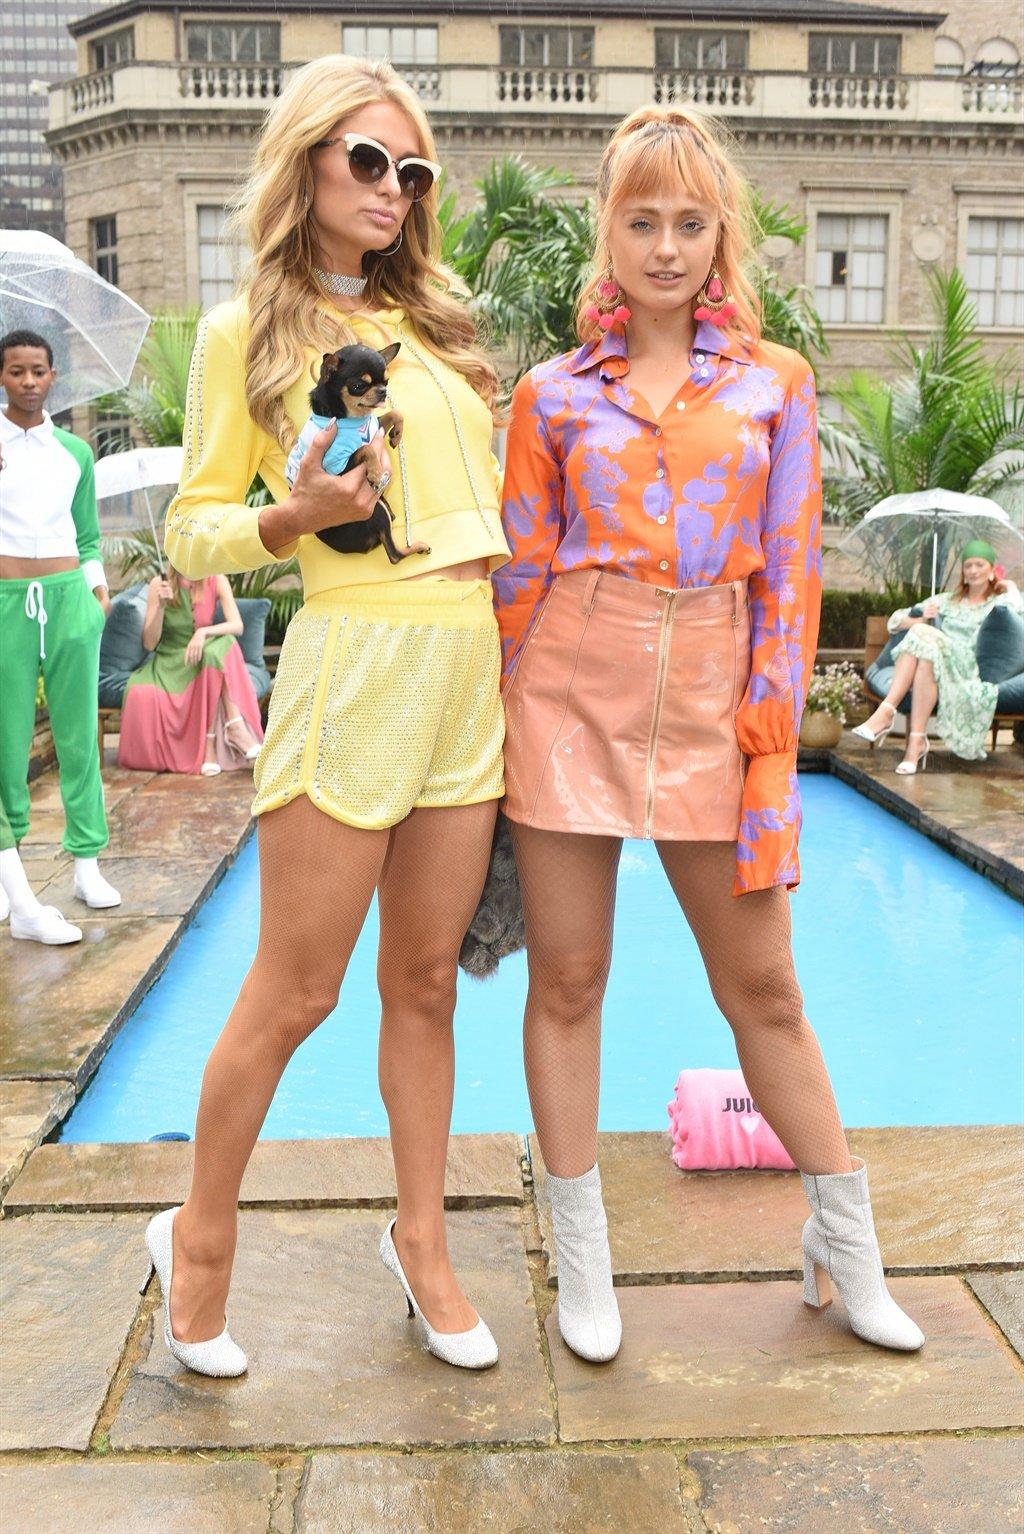 NEW YORK, NY - SEPTEMBER 13:  Paris Hilton and Bra